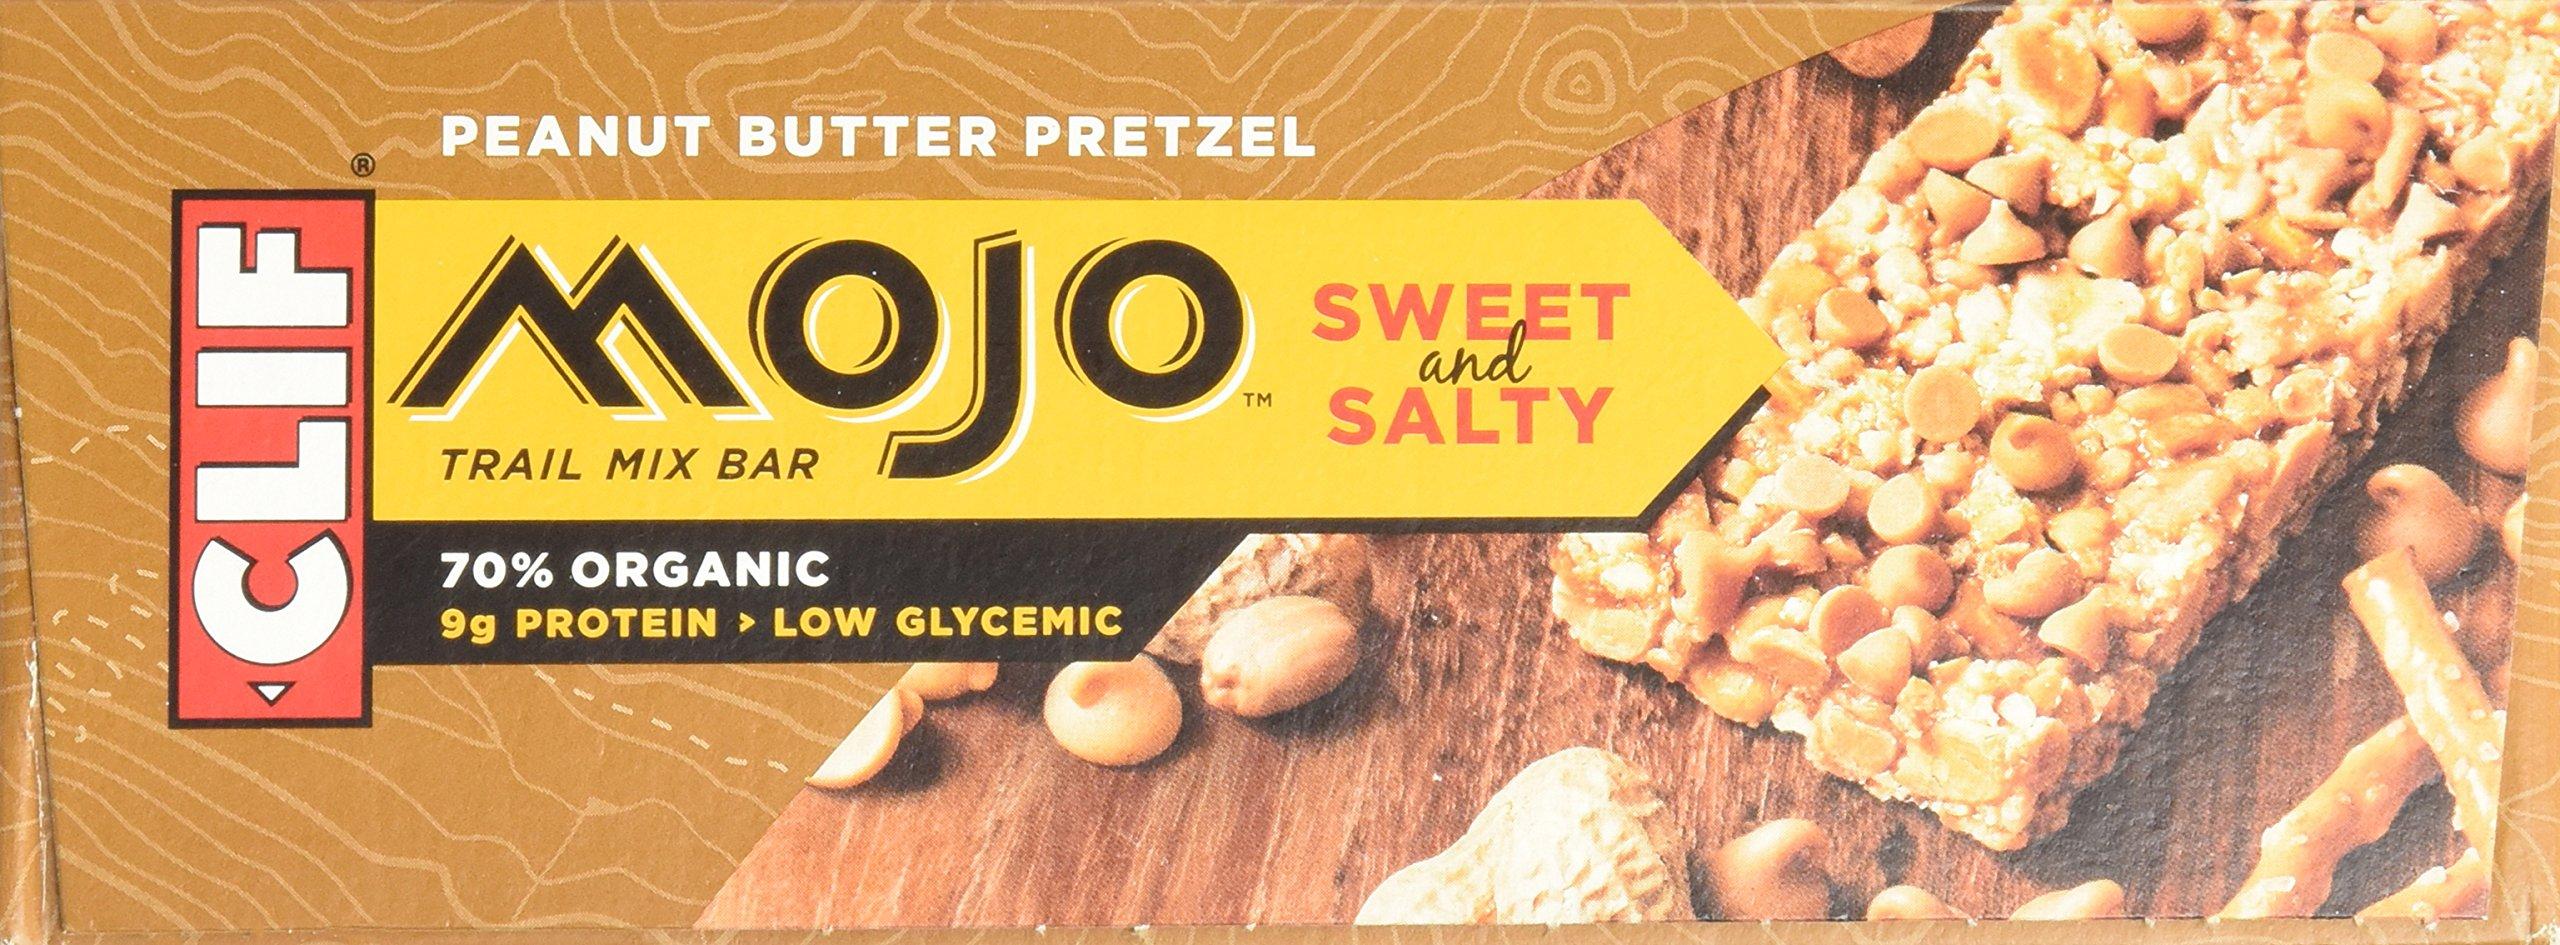 Clif Mojo Bar, Peanut Butter Pretzel, Net Wt. 19.08 Oz. 12 Count (Pack of 2) by Clif Bar (Image #4)